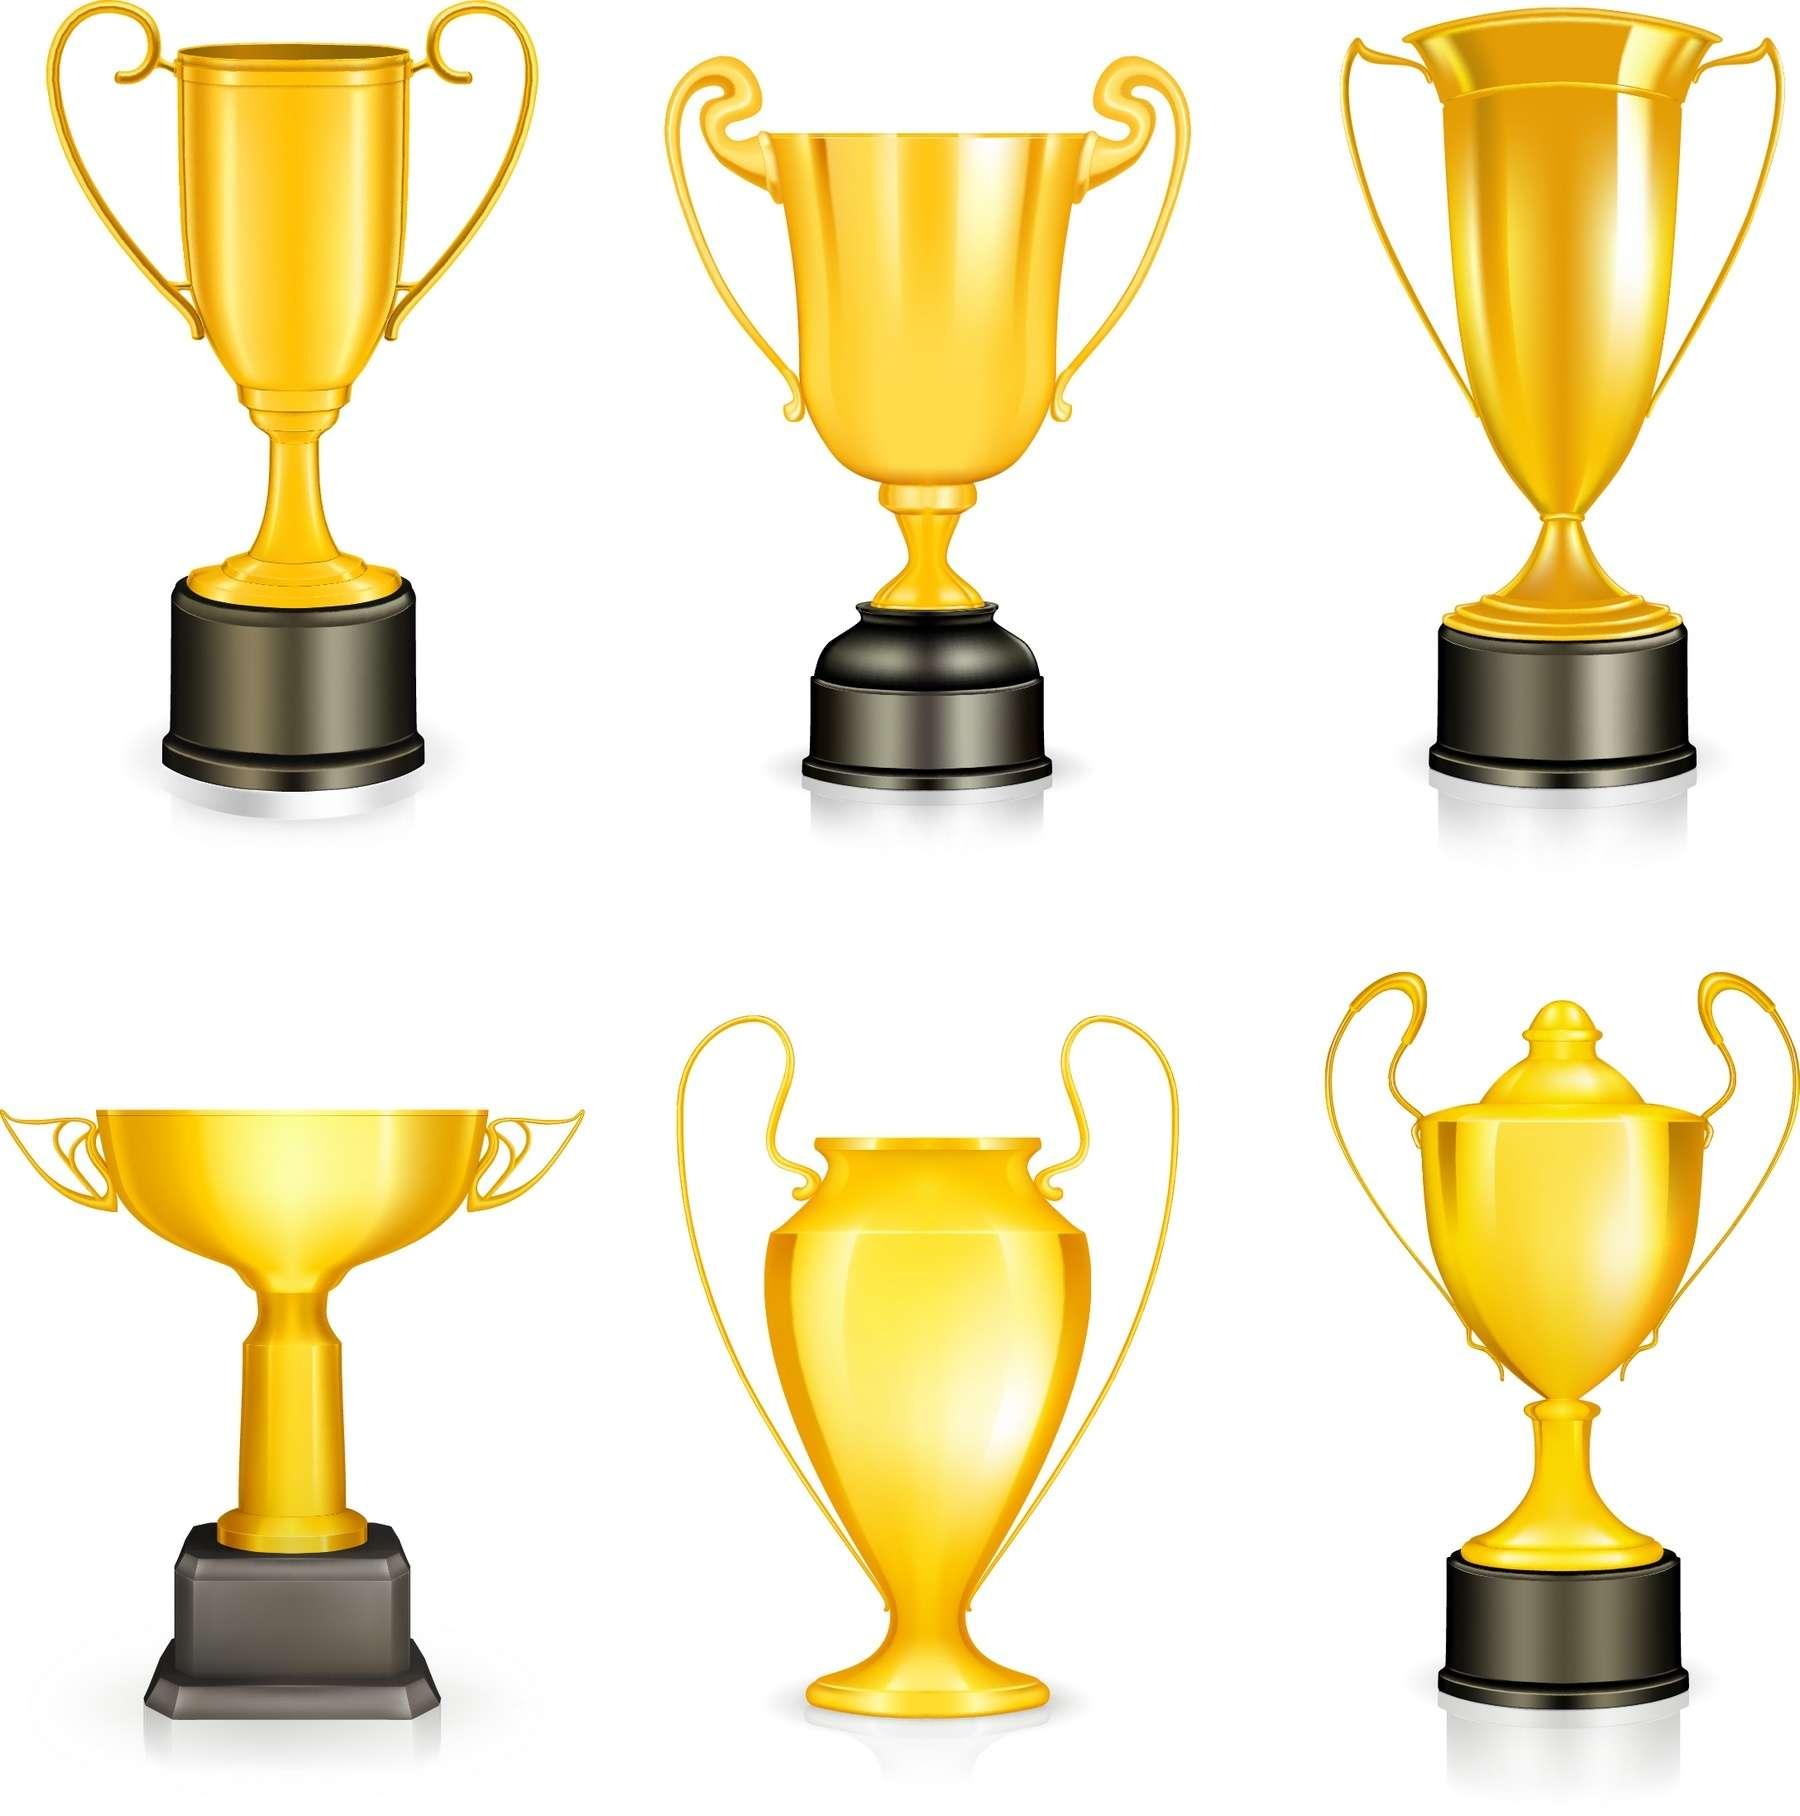 Golden Cups png